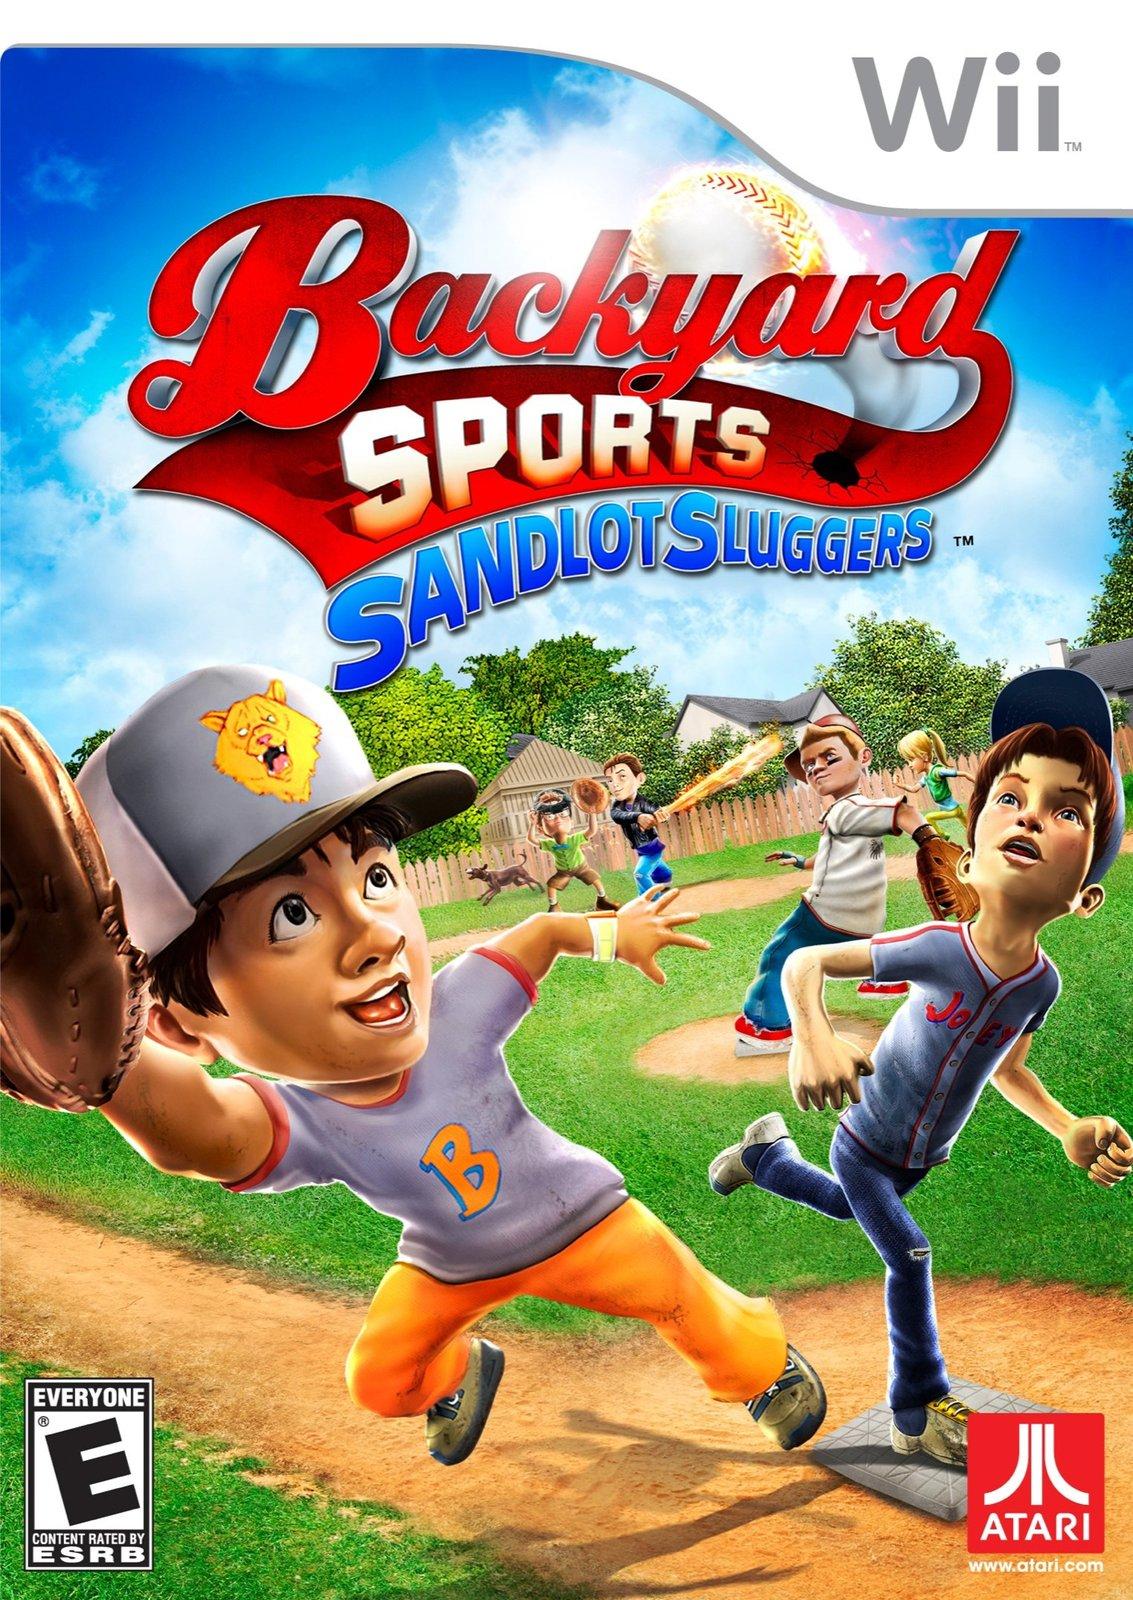 Exceptionnel File:Backyard Sports Sandlot Sluggers